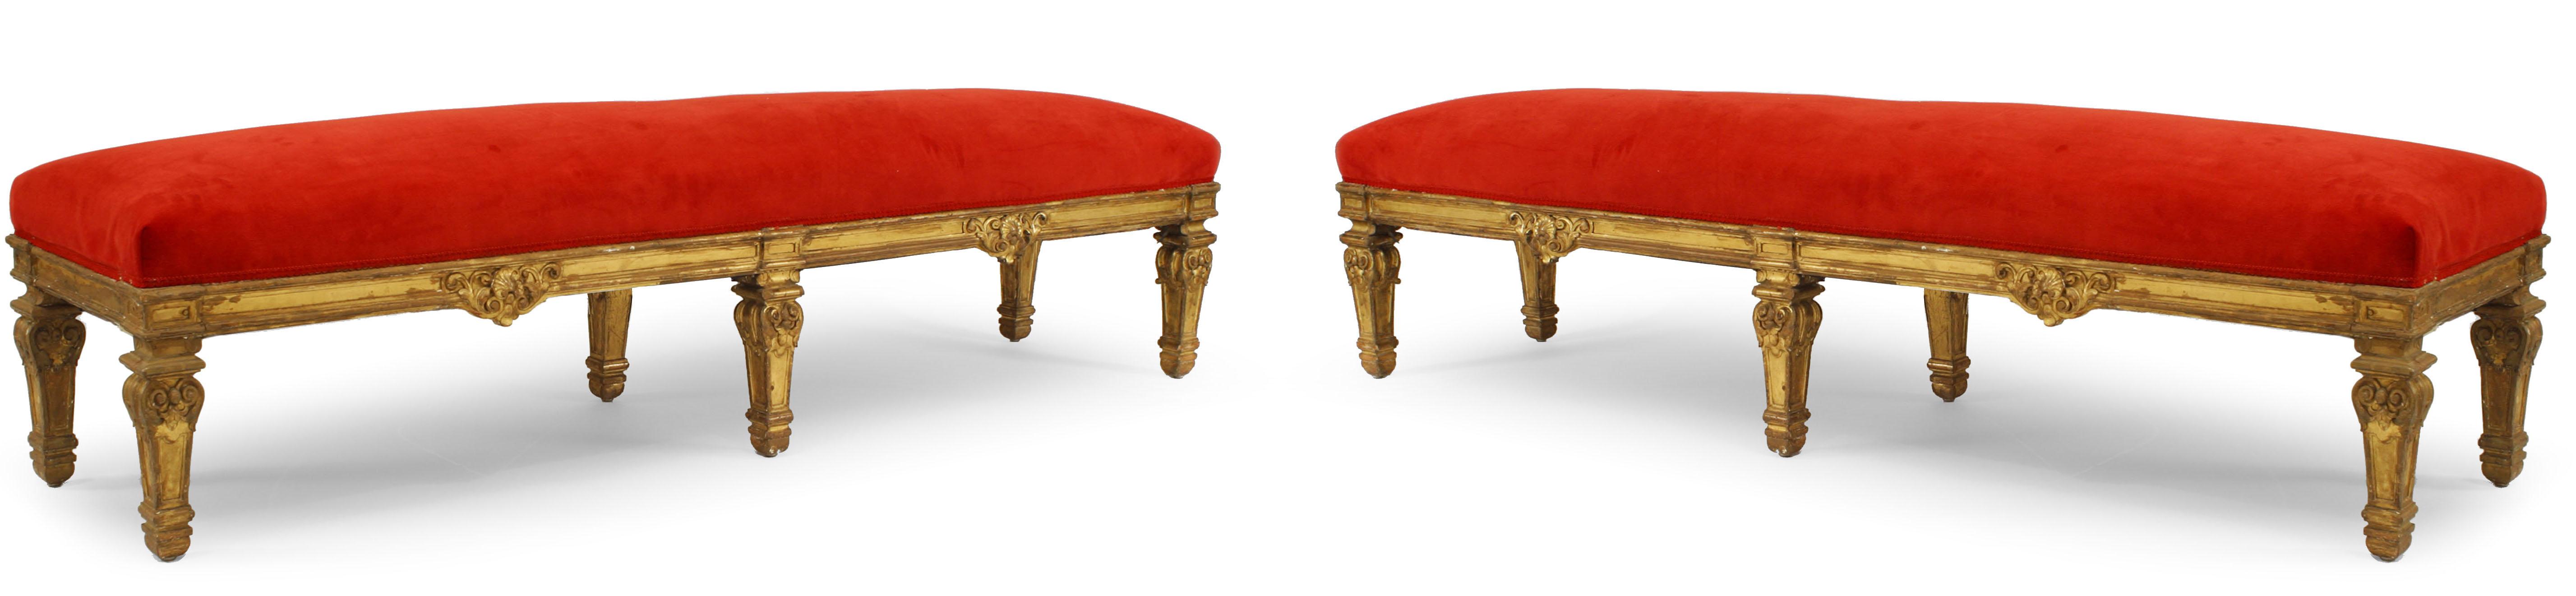 French Louis Xiv Red Velvet Bench